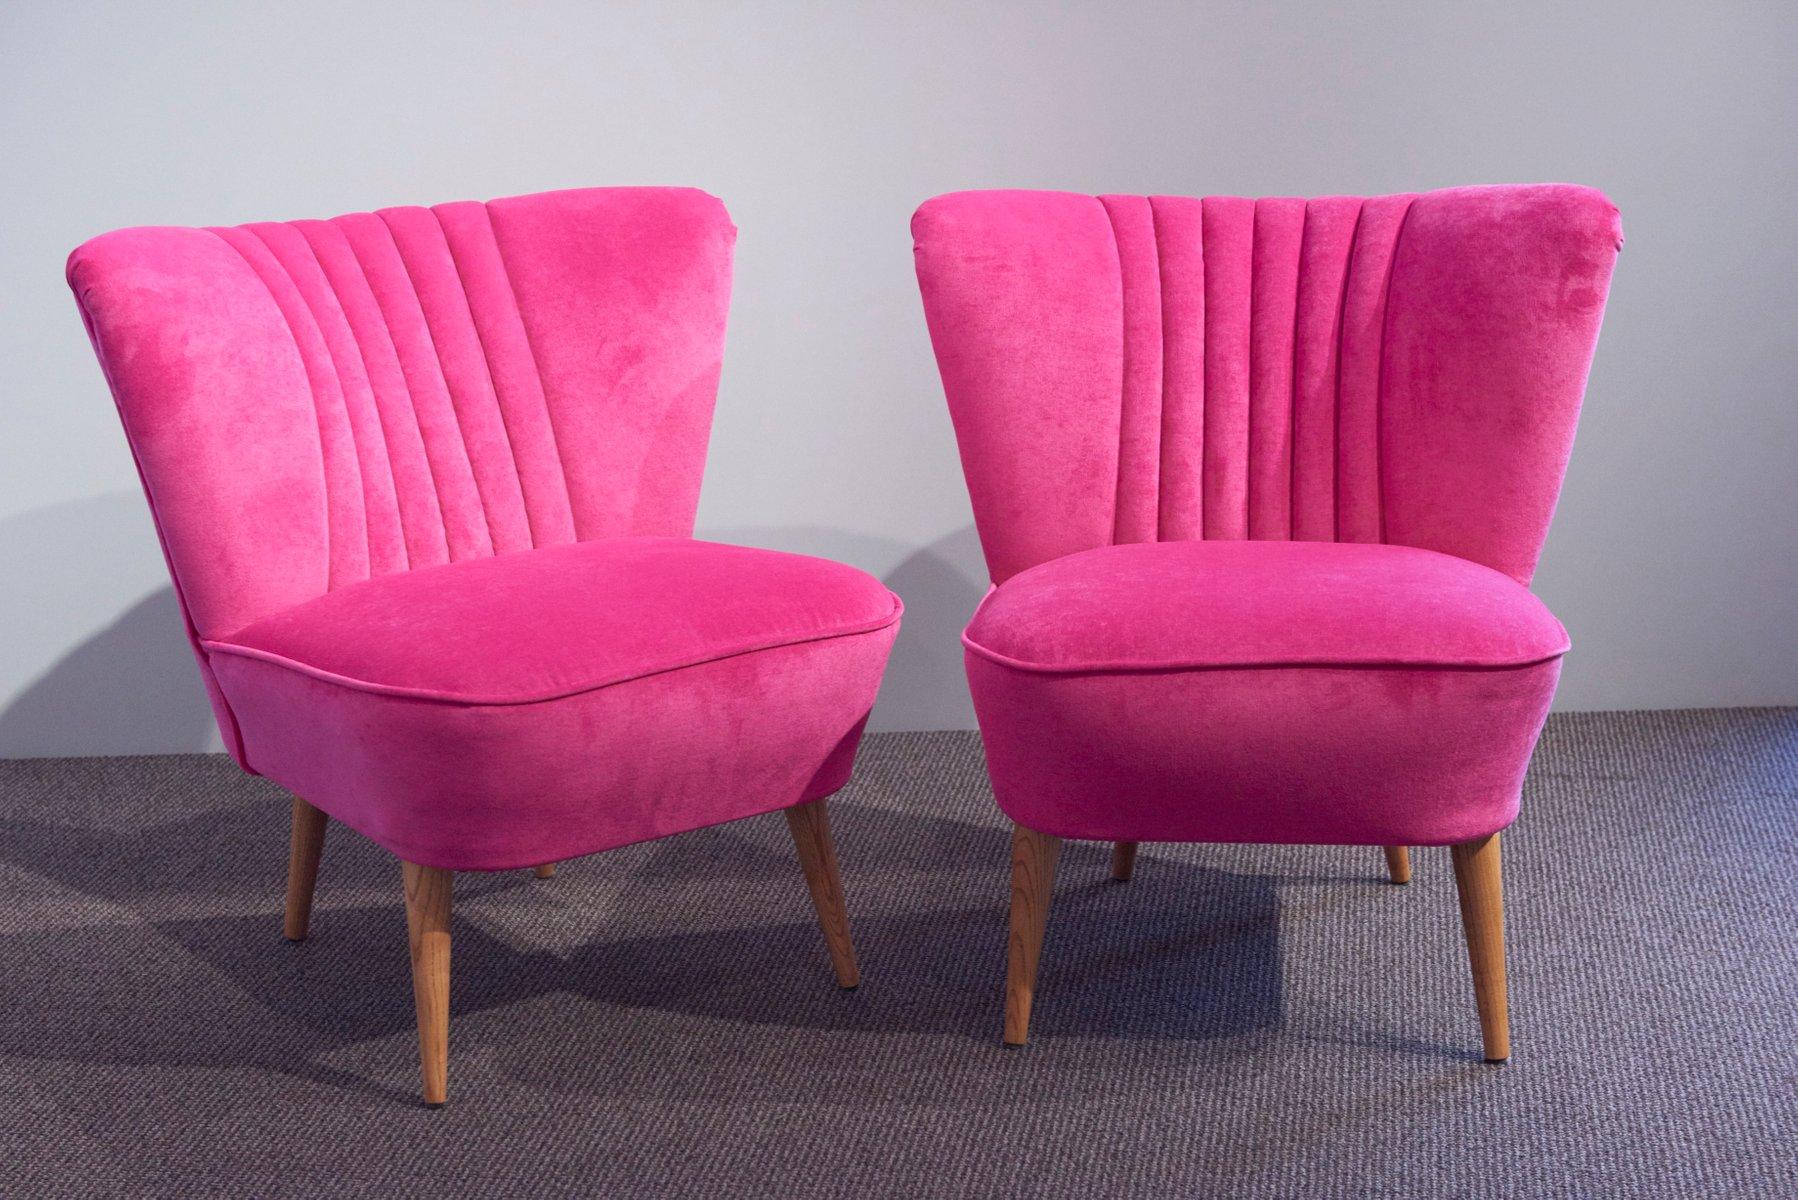 german shell back pink velvet cocktail chairs 1950s set of 2 for sale at pamono. Black Bedroom Furniture Sets. Home Design Ideas